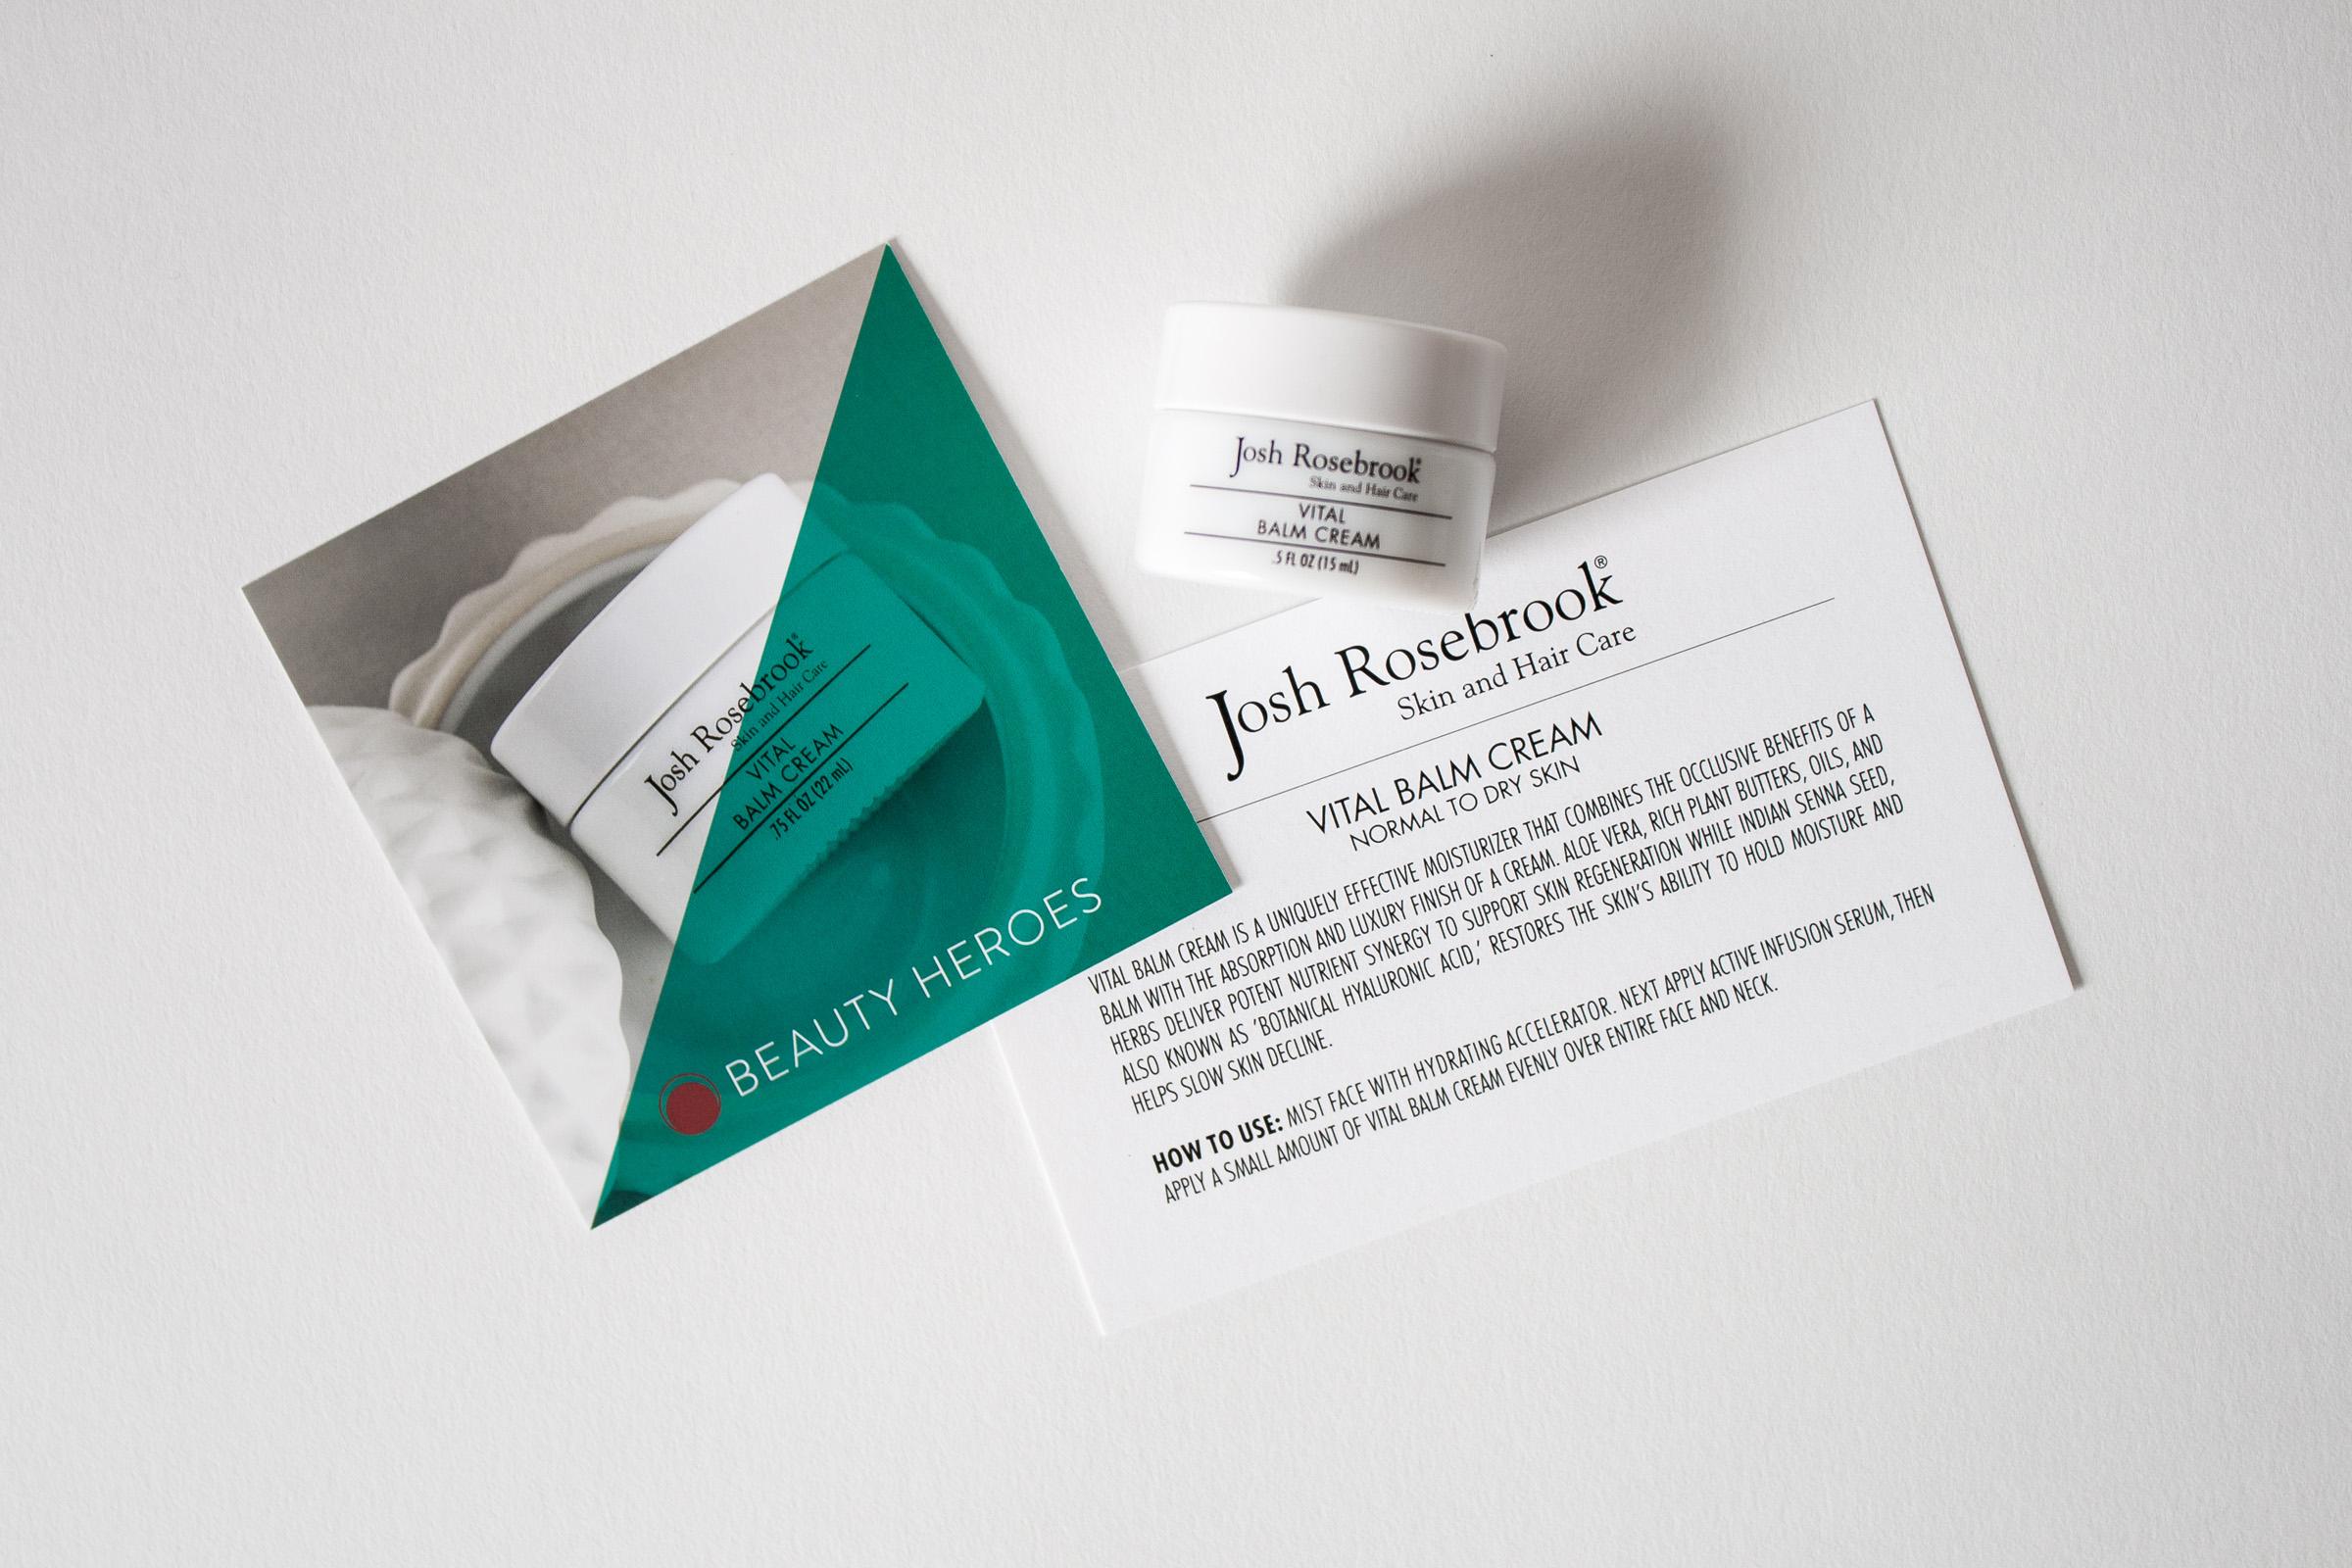 Beauty Heroes Review - July Box - Josh Rosebrook Beauty Vital Balm Cream and Nutrient Day Cream SPF 30